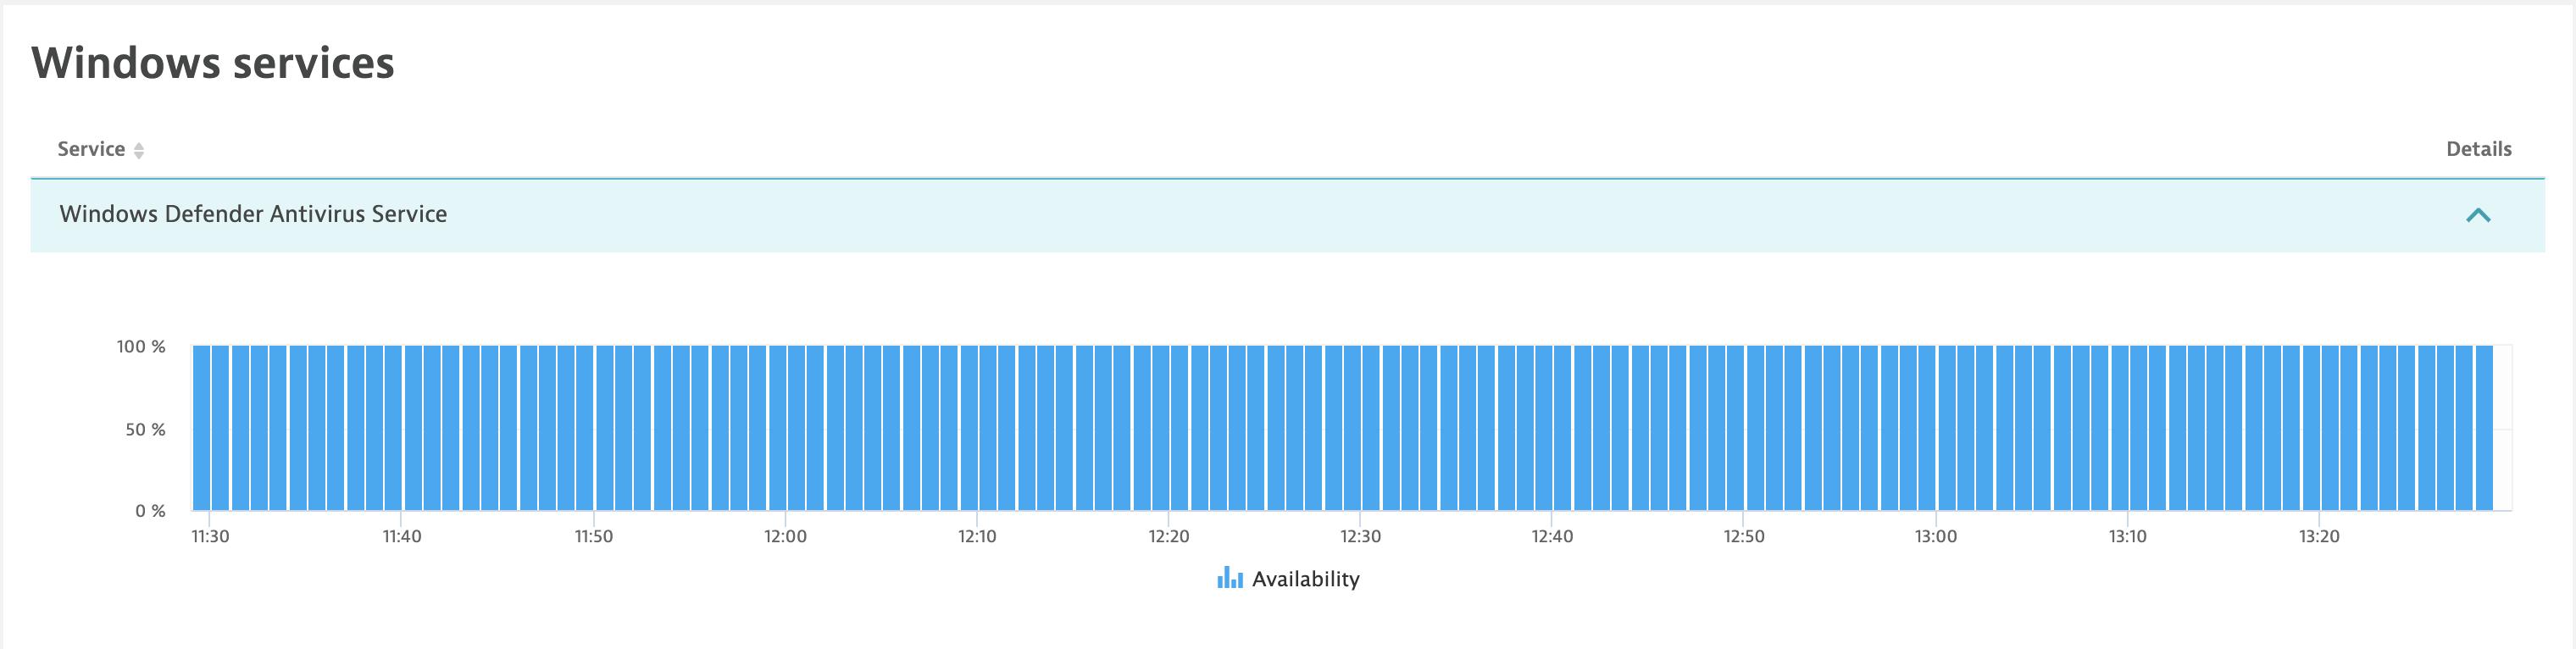 Windows service availability timeseries graph